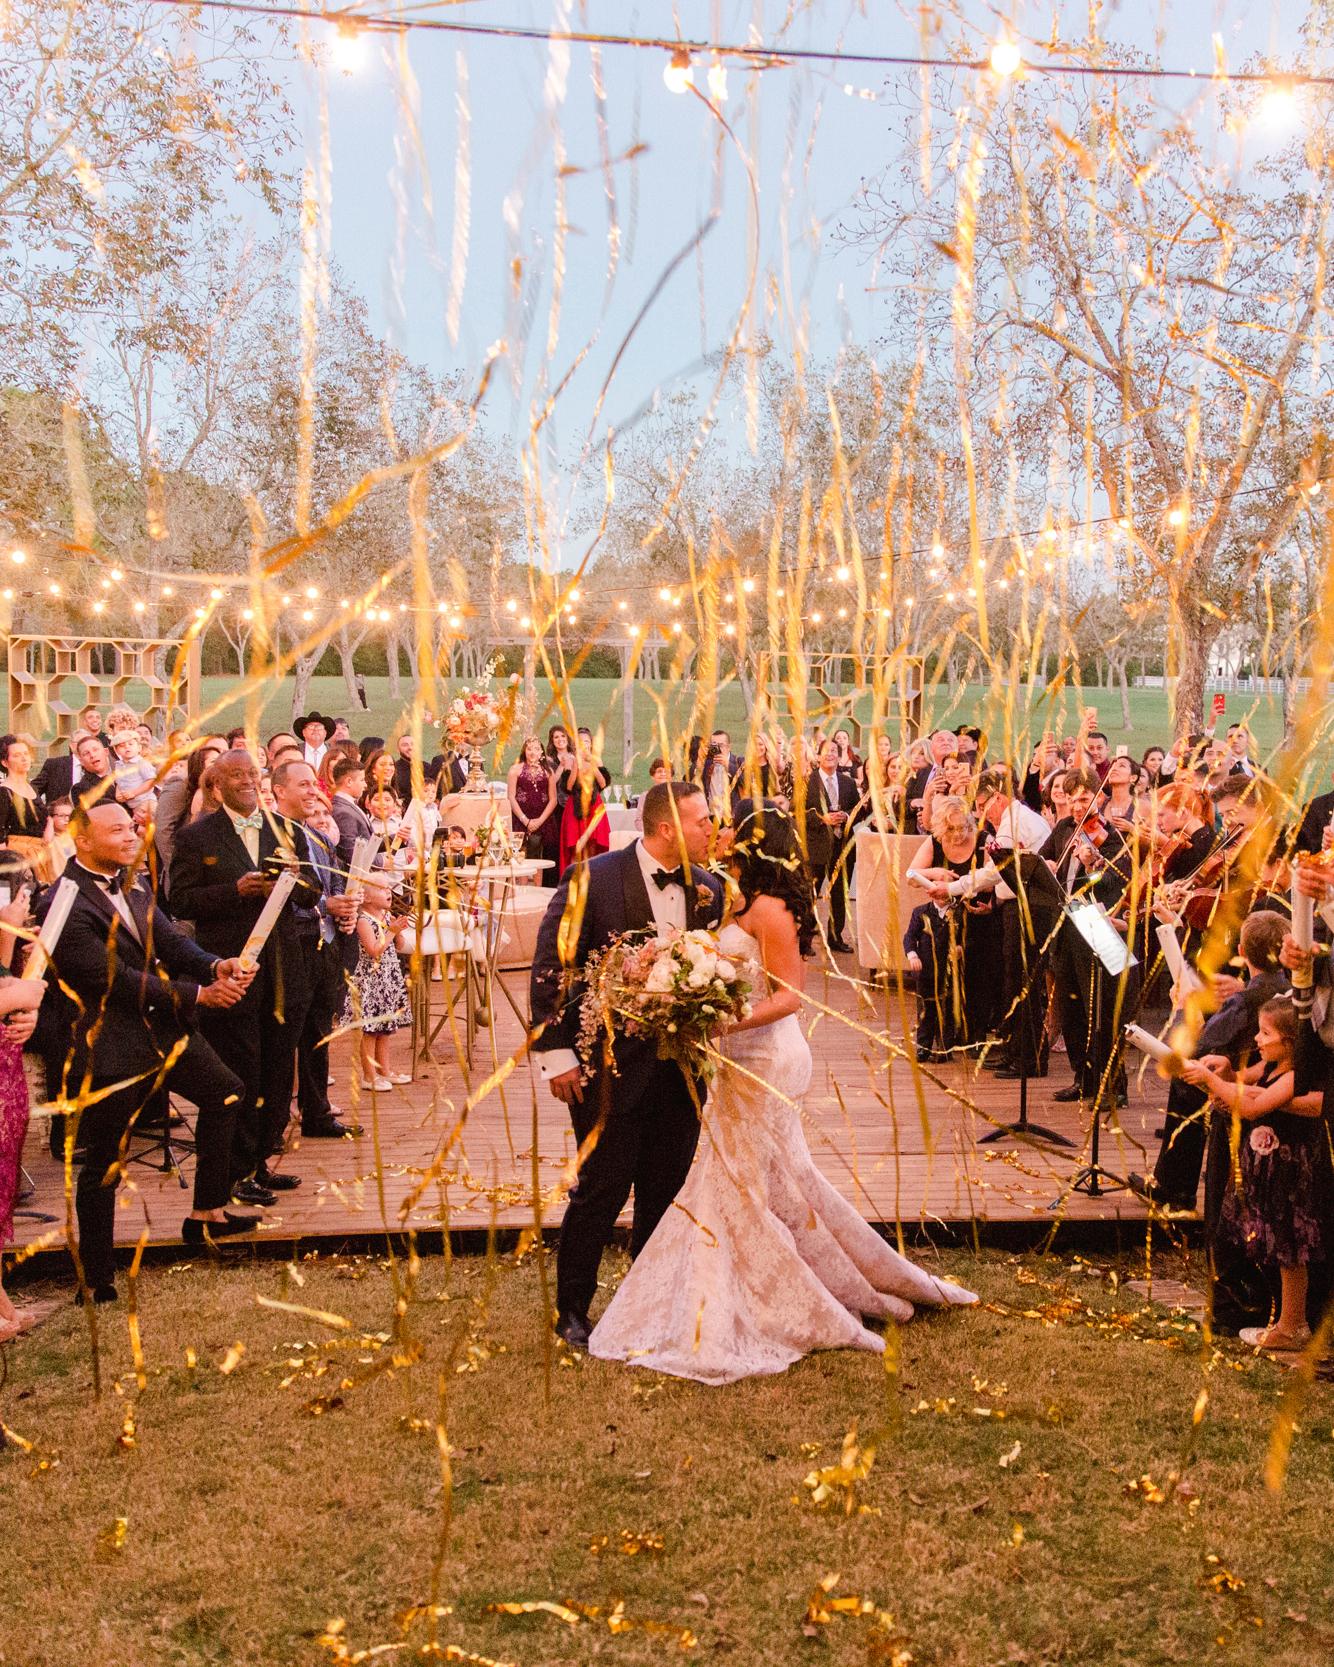 suzanne joseph wedding streamers corbin gurkin